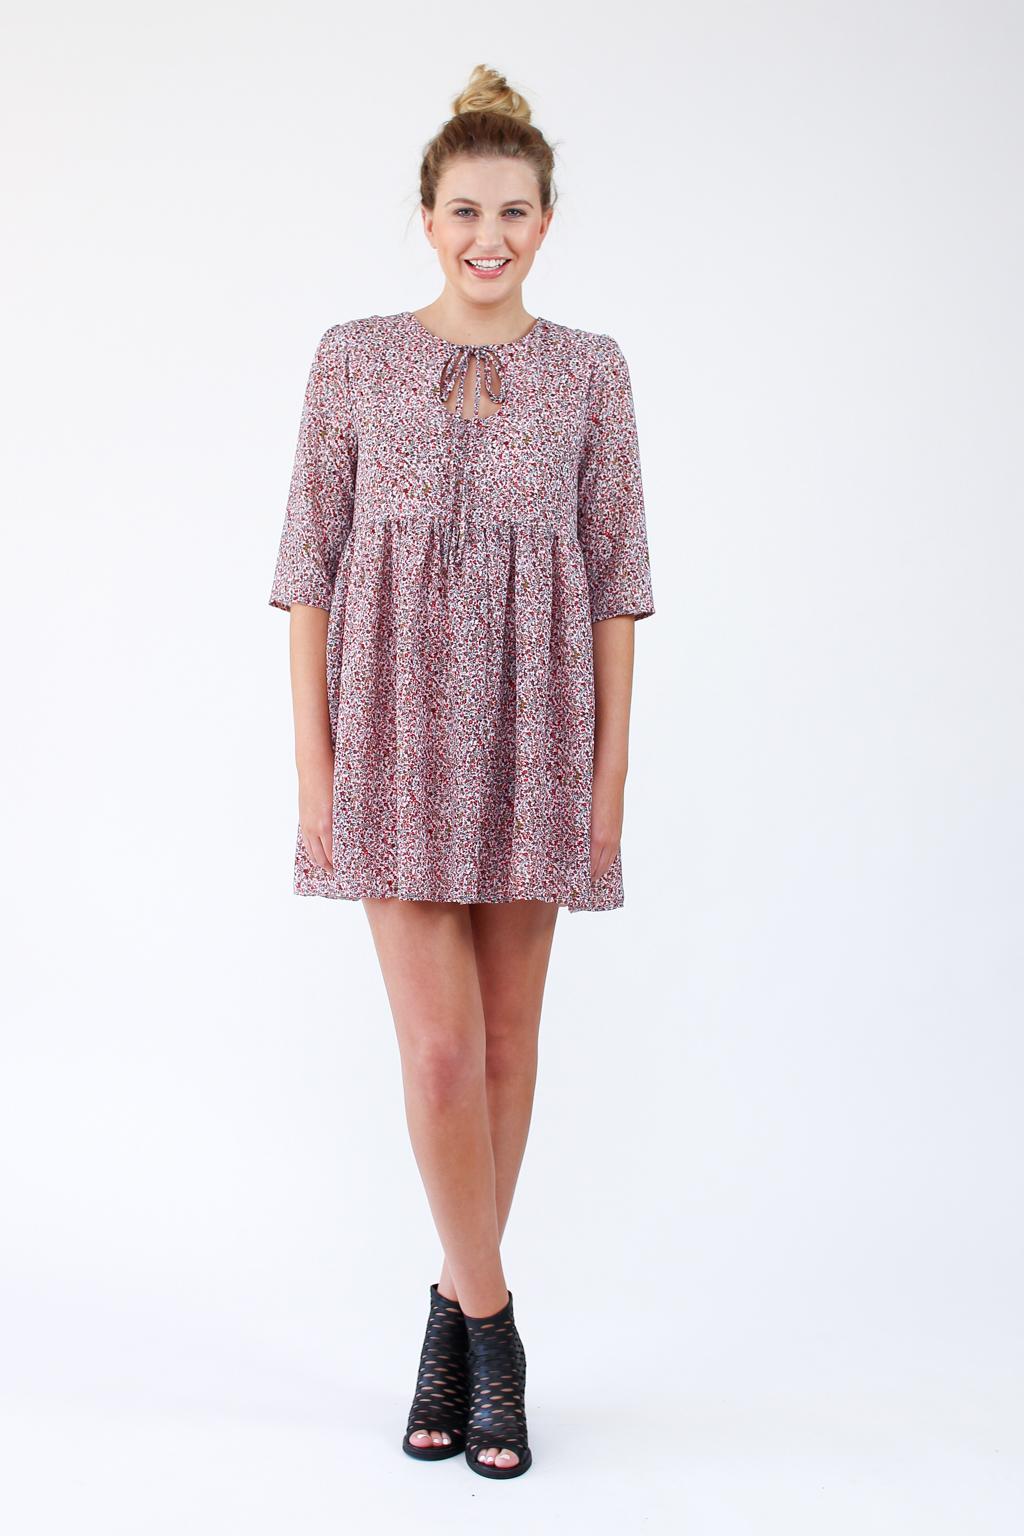 Megan Nielsen Sudley sewing pattern